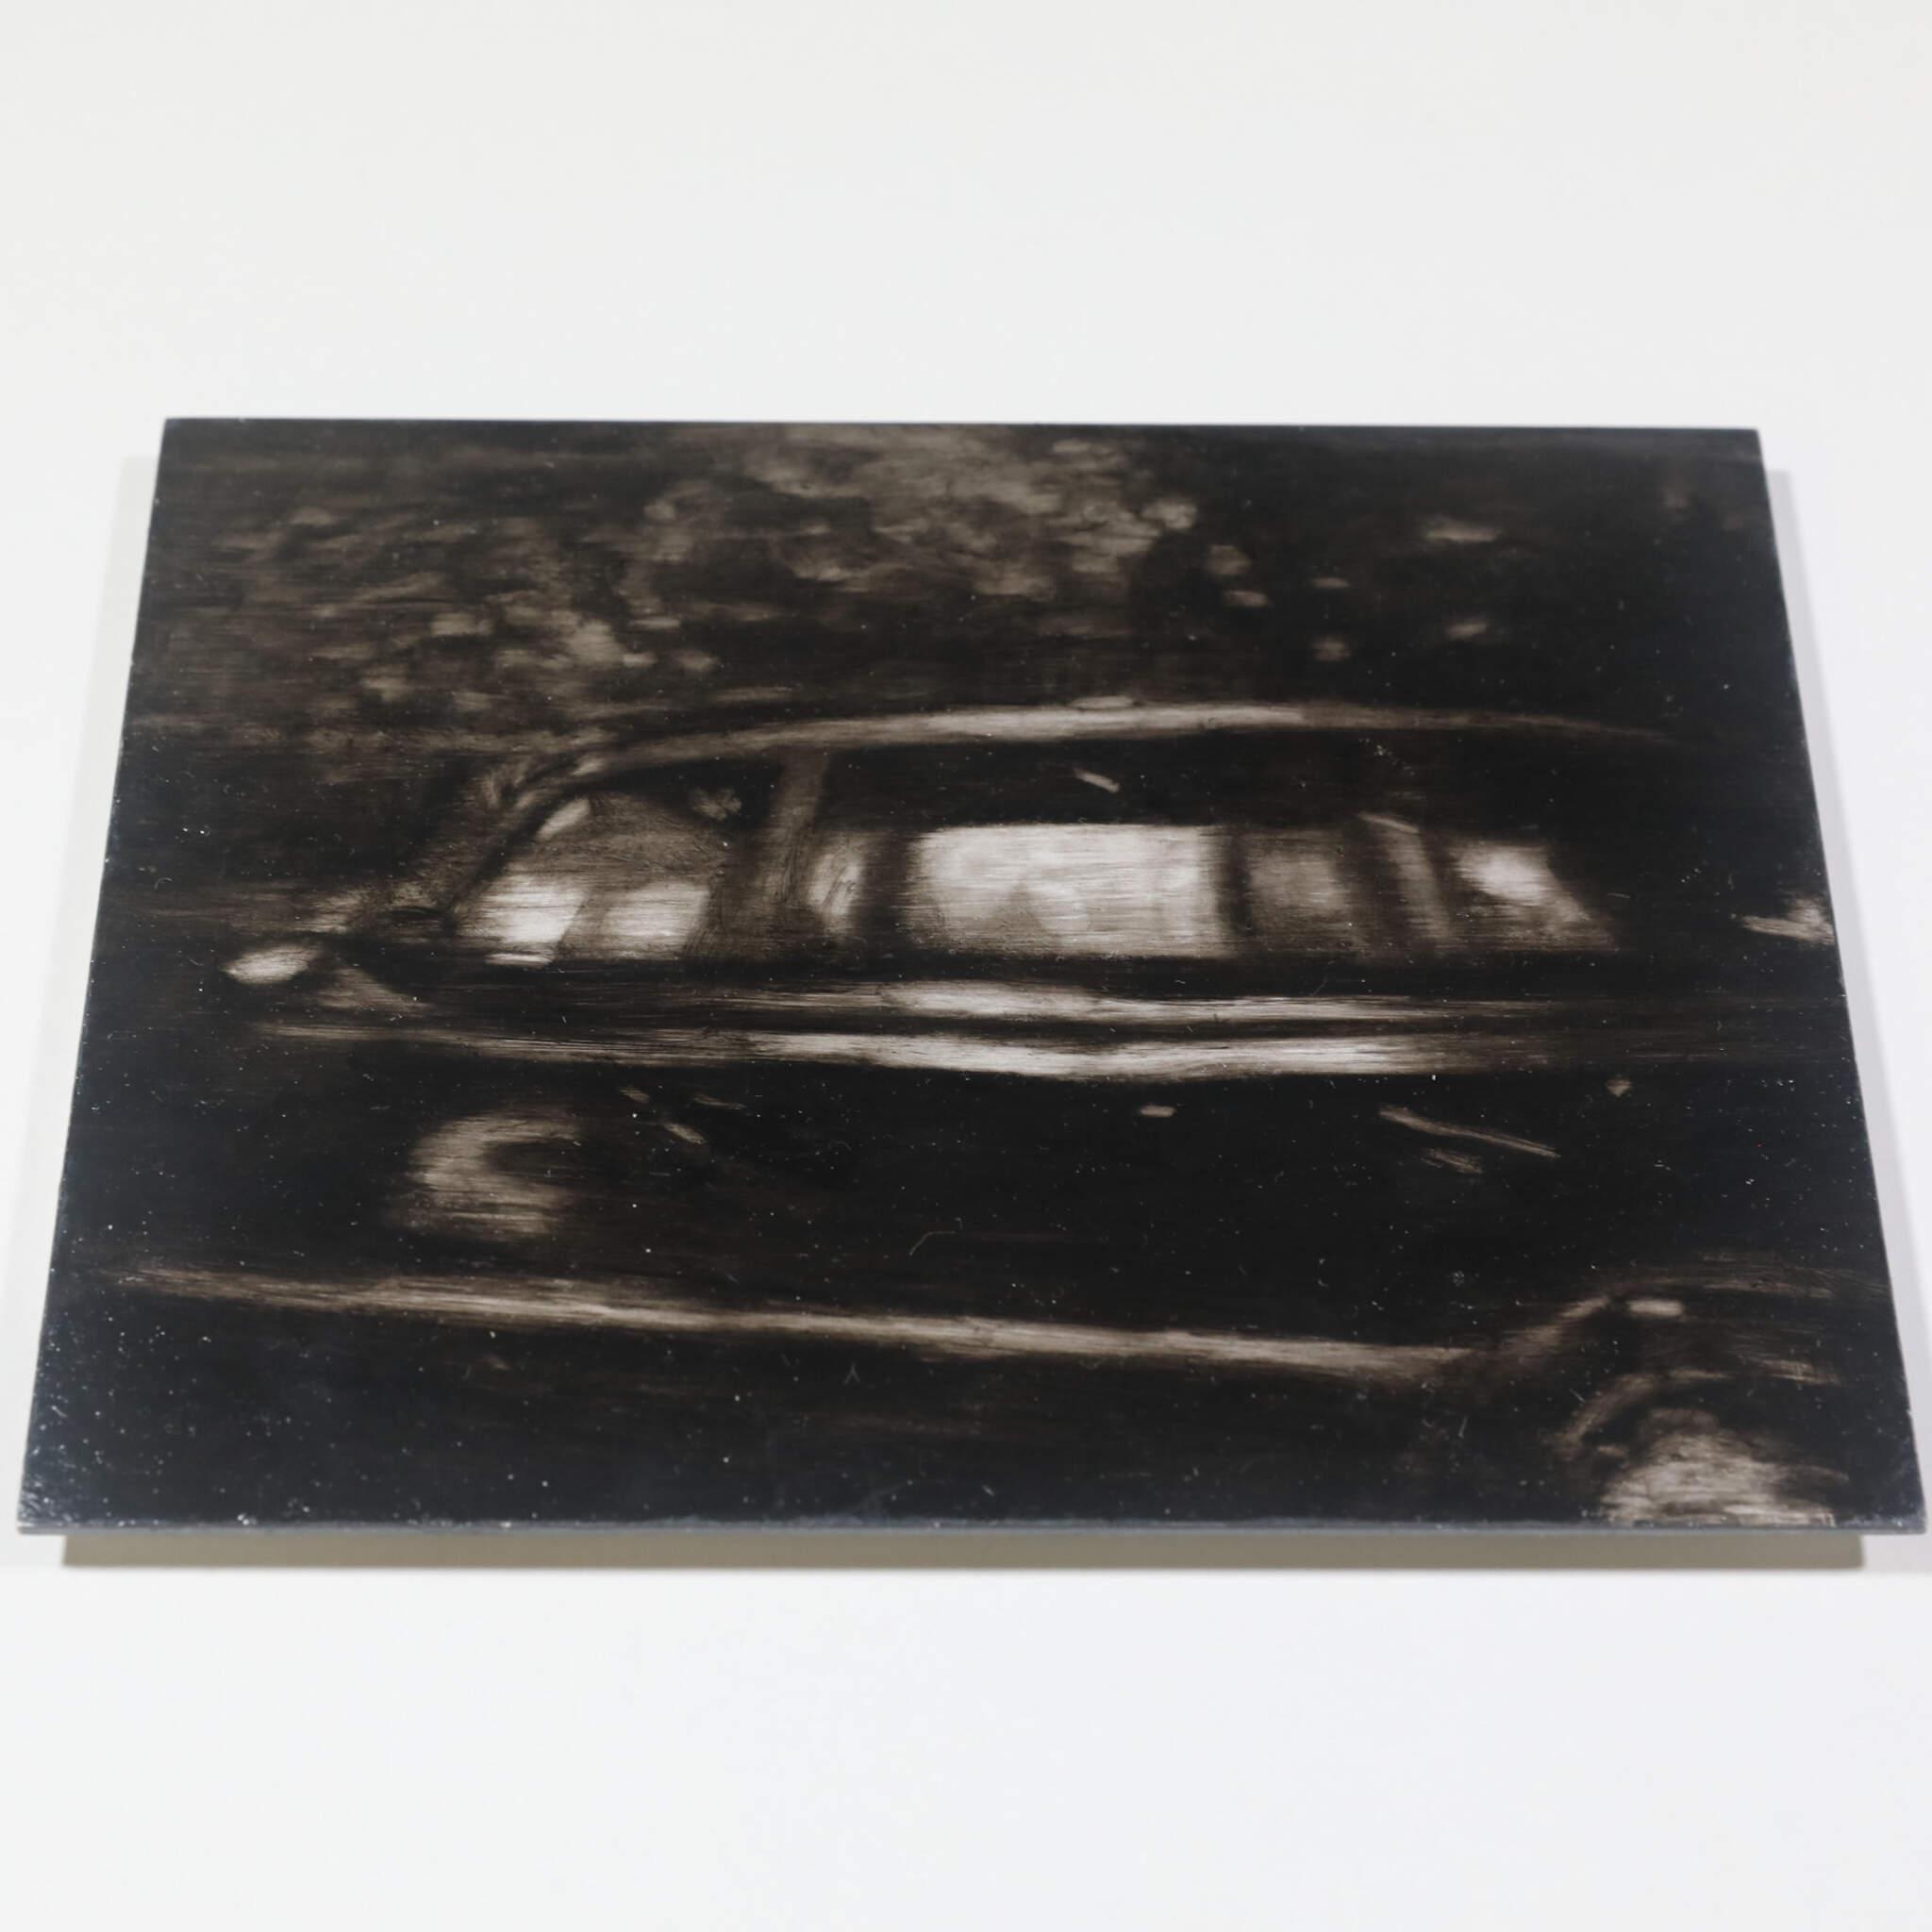 364A0622 EF95 49C7 BAE1 4C7902A977A7 - Black Cab. Central London. 27/4/20 by Jackie Clark